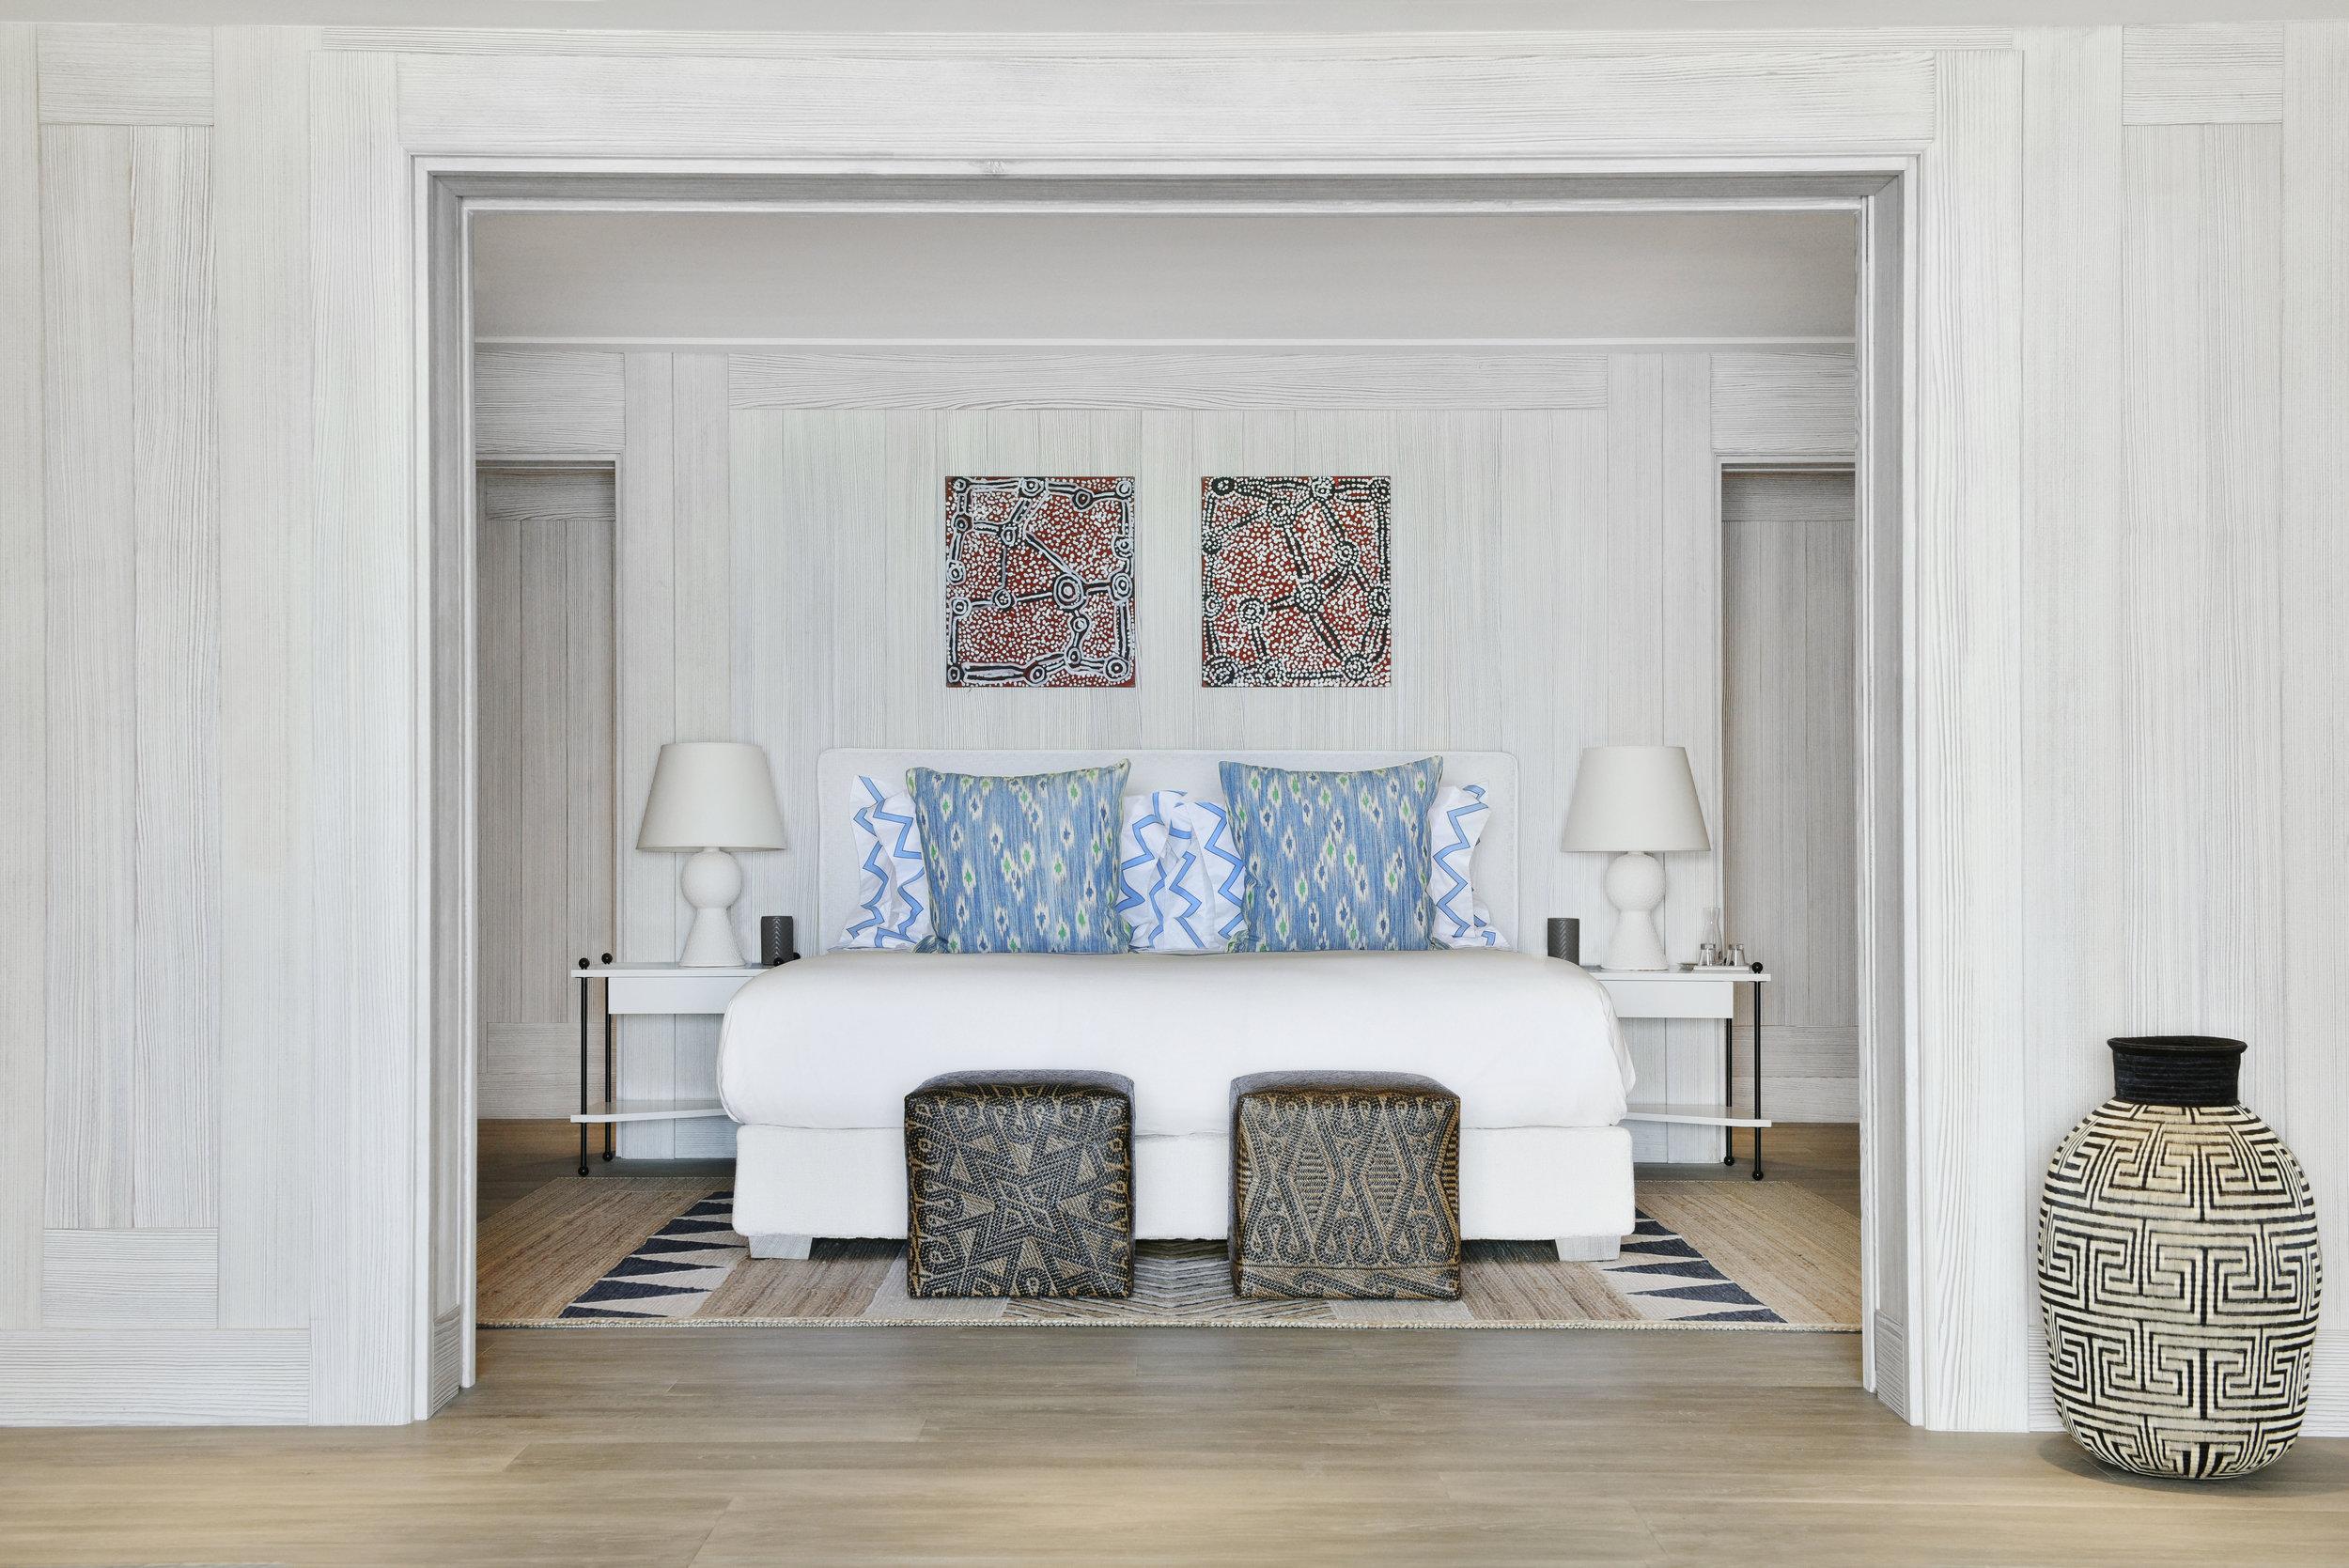 20180807032244_2-1-cheval-blanc-st-barth-isle-de-france-room-by-jacques-grange-v-mati-0424.jpg